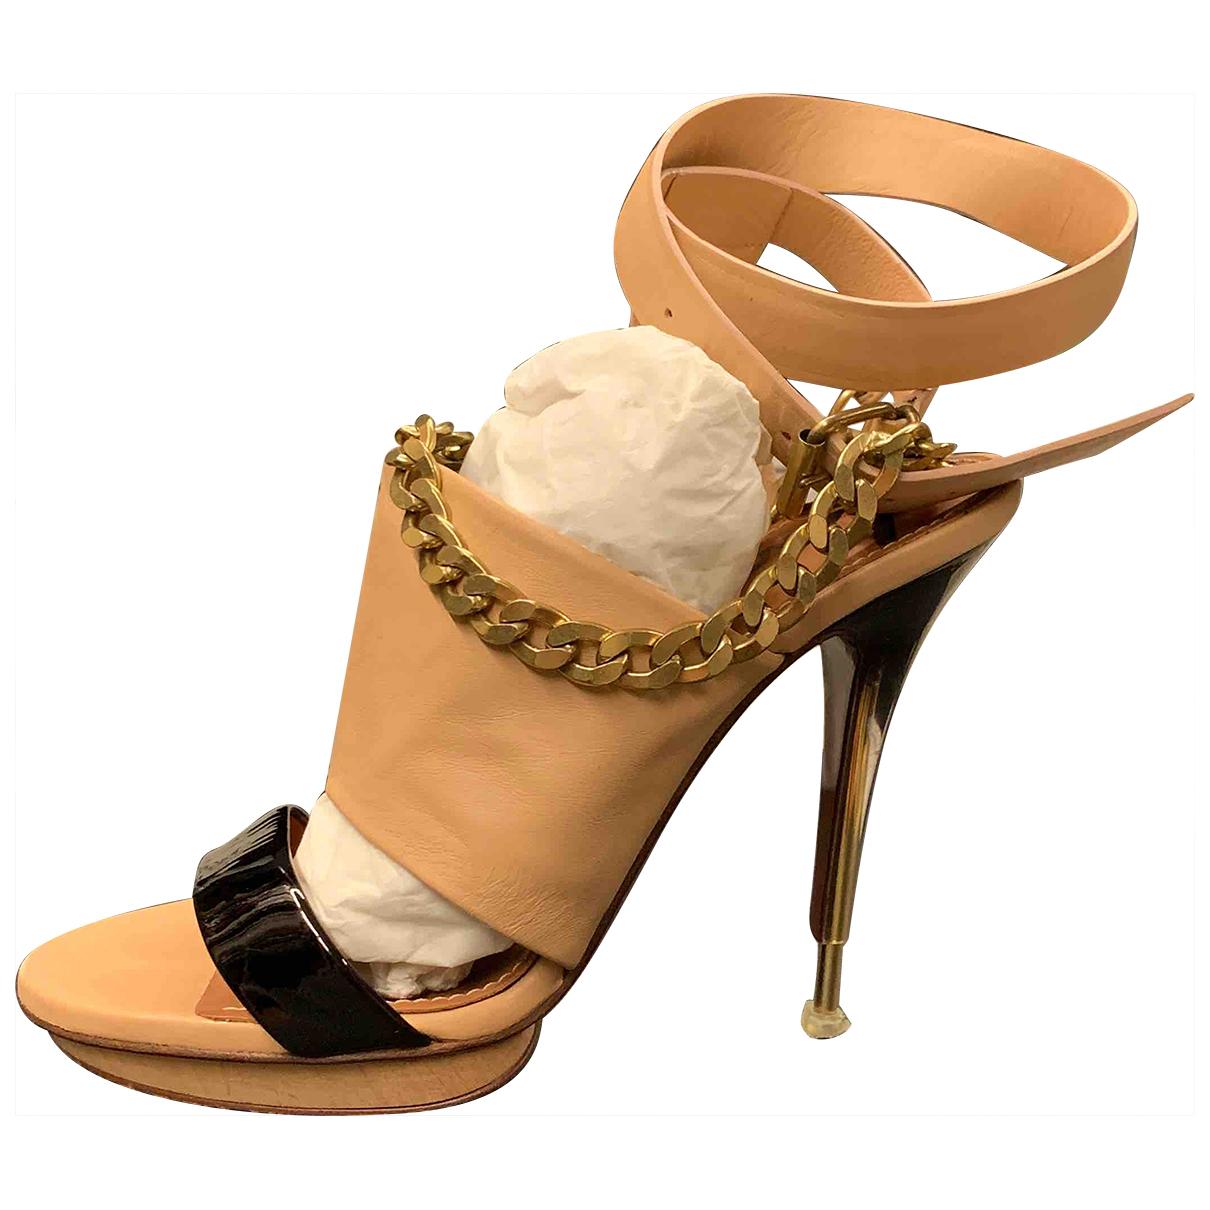 Lanvin \N Beige Leather Sandals for Women 39 EU